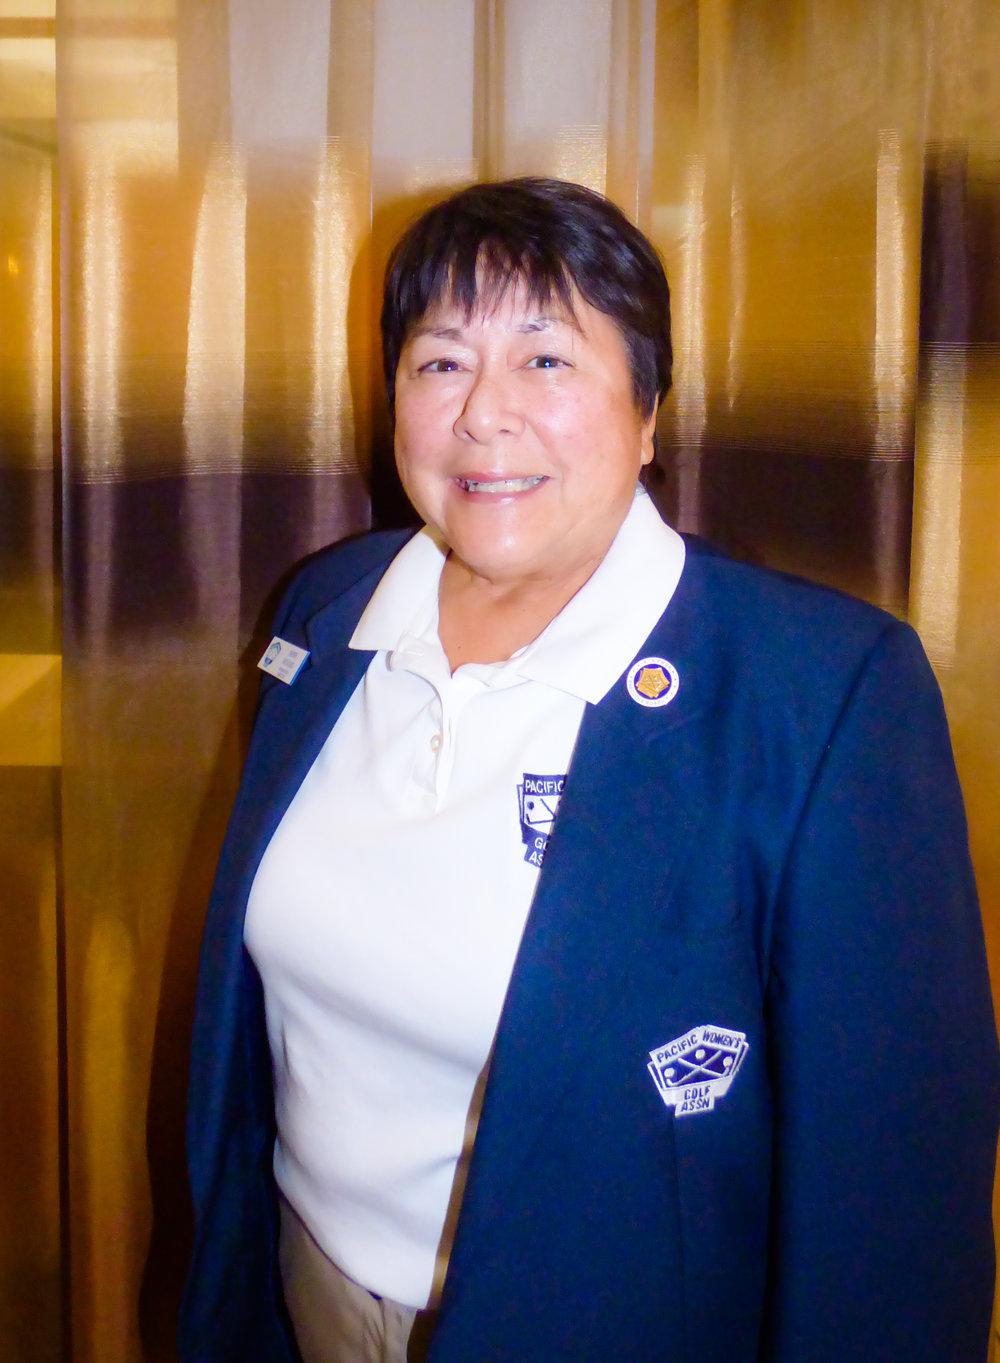 Jane House, Fresno Area Director